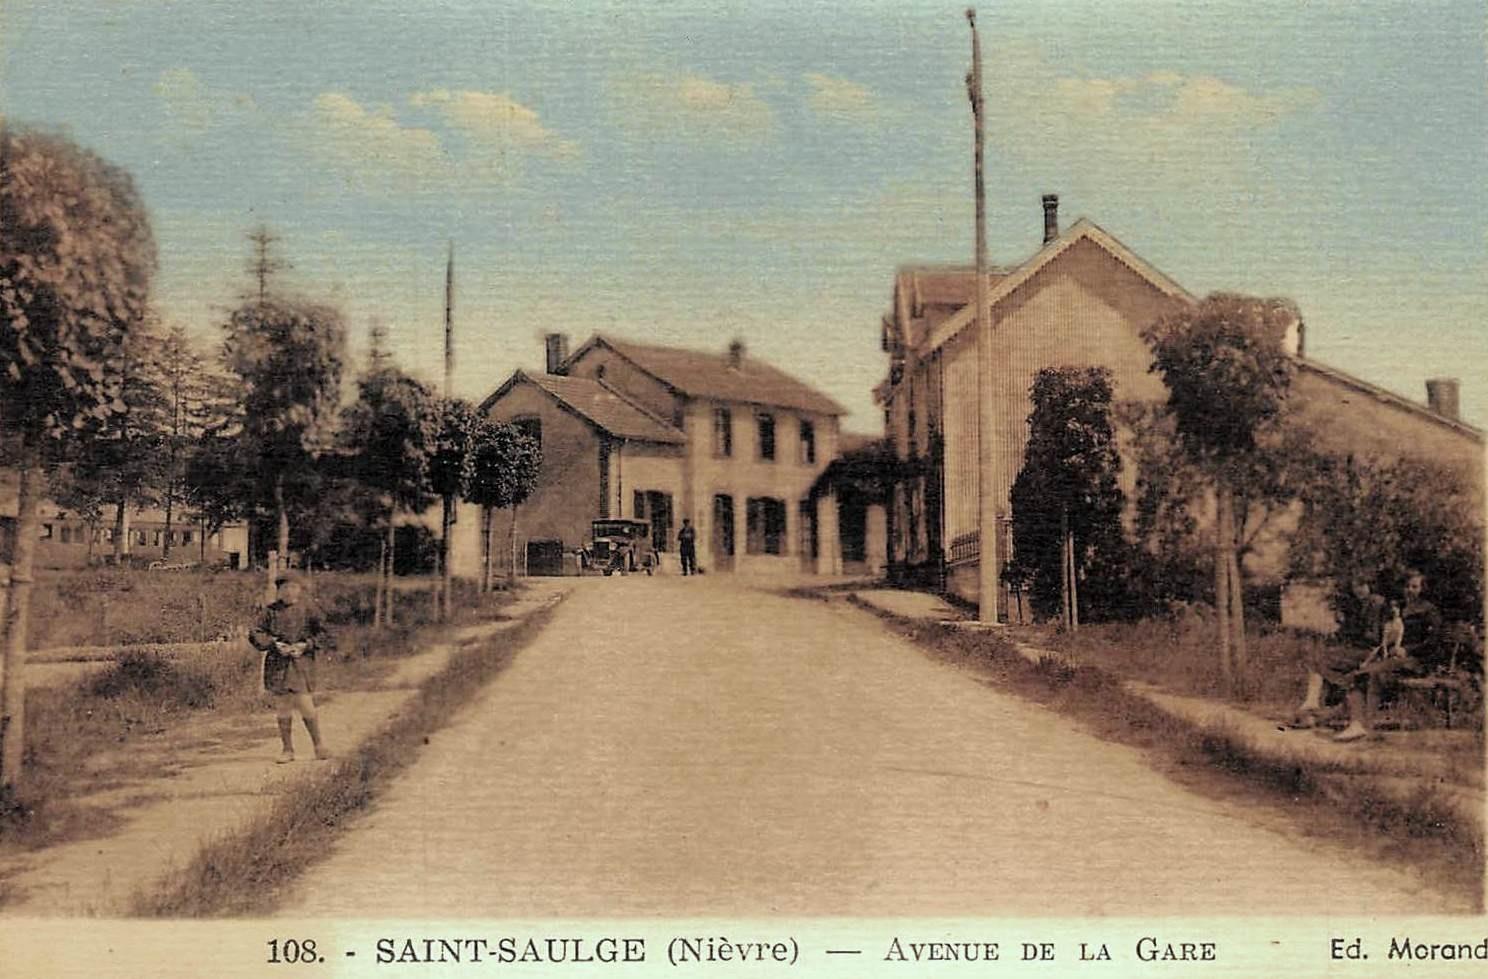 Saint-Saulge (Nièvre) La rue de la Gare CPA